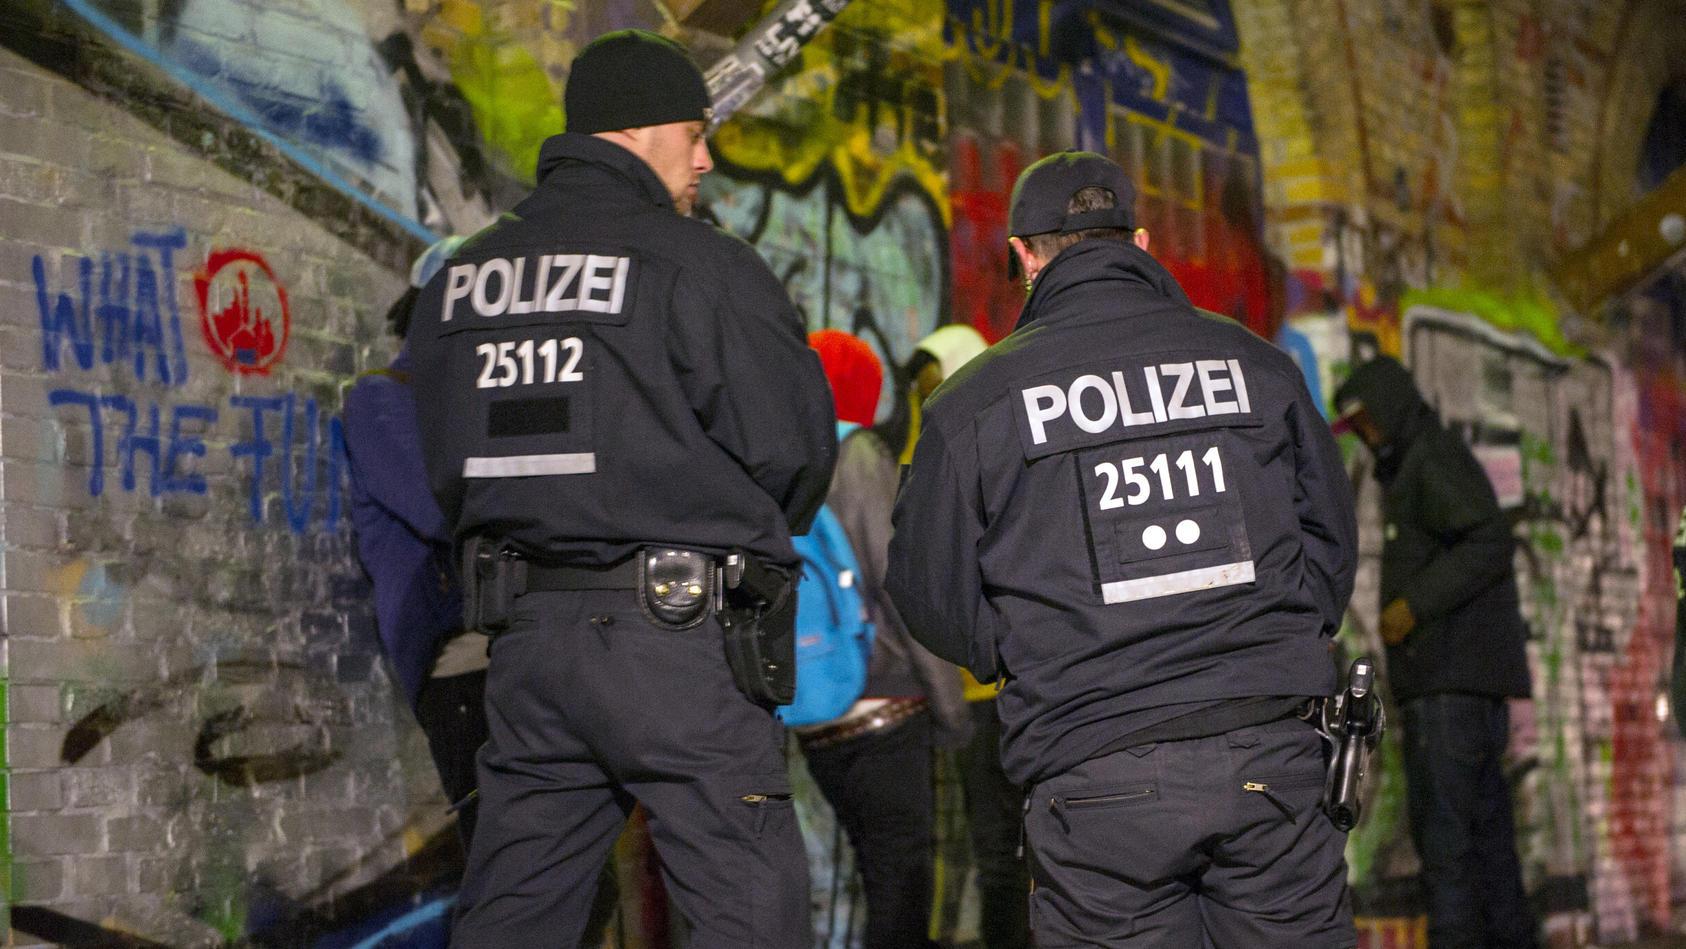 Polizisten kontrollieren Personen im Görlitzer Park in Berlin.